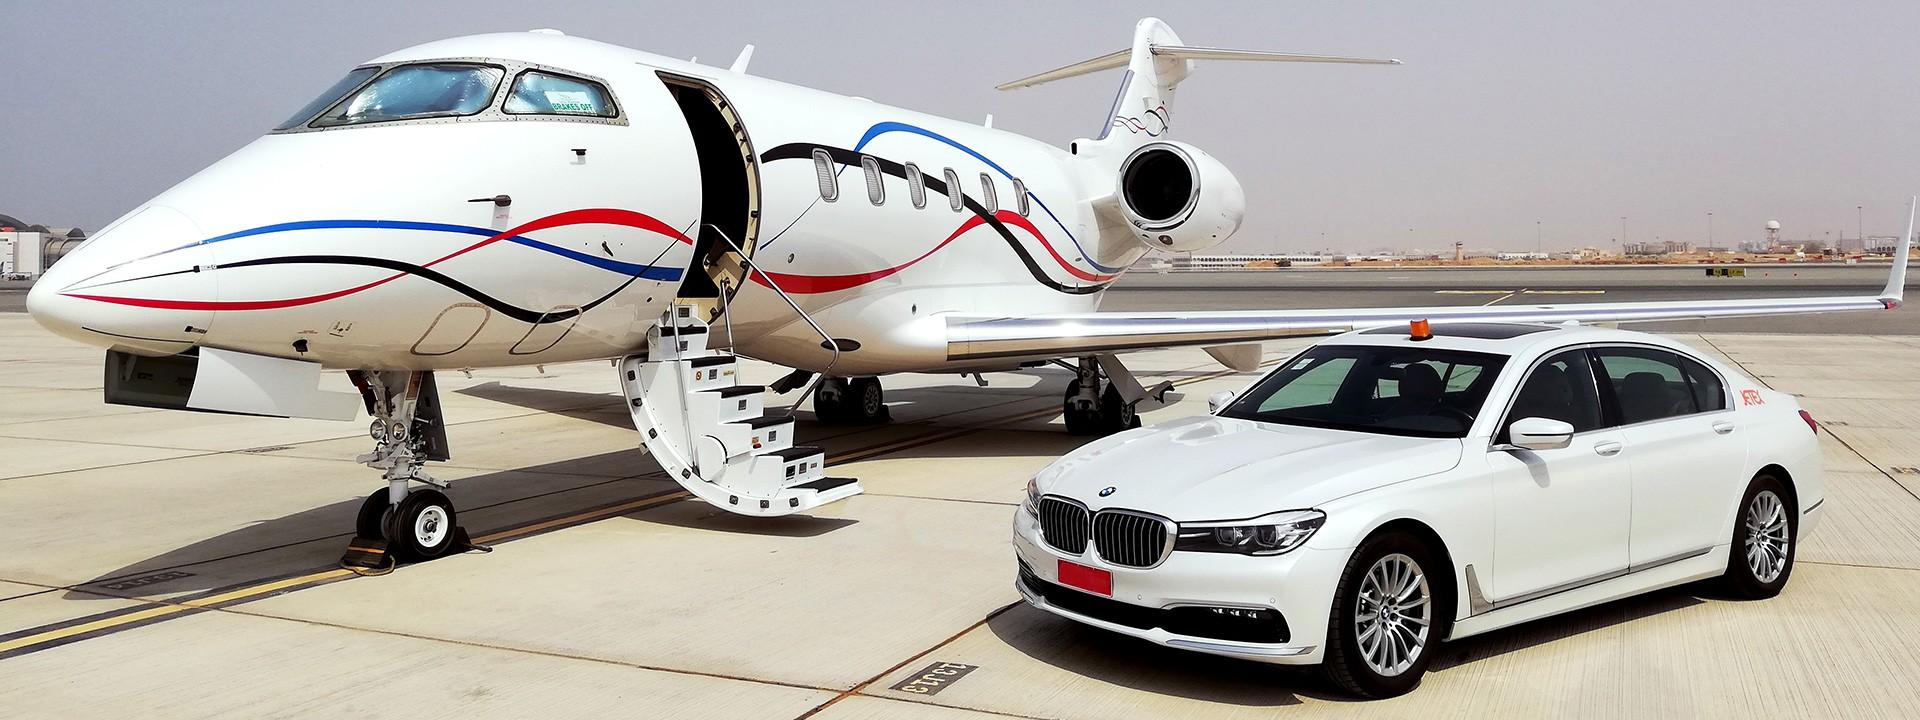 Muscat Oman MCT OOMS 01